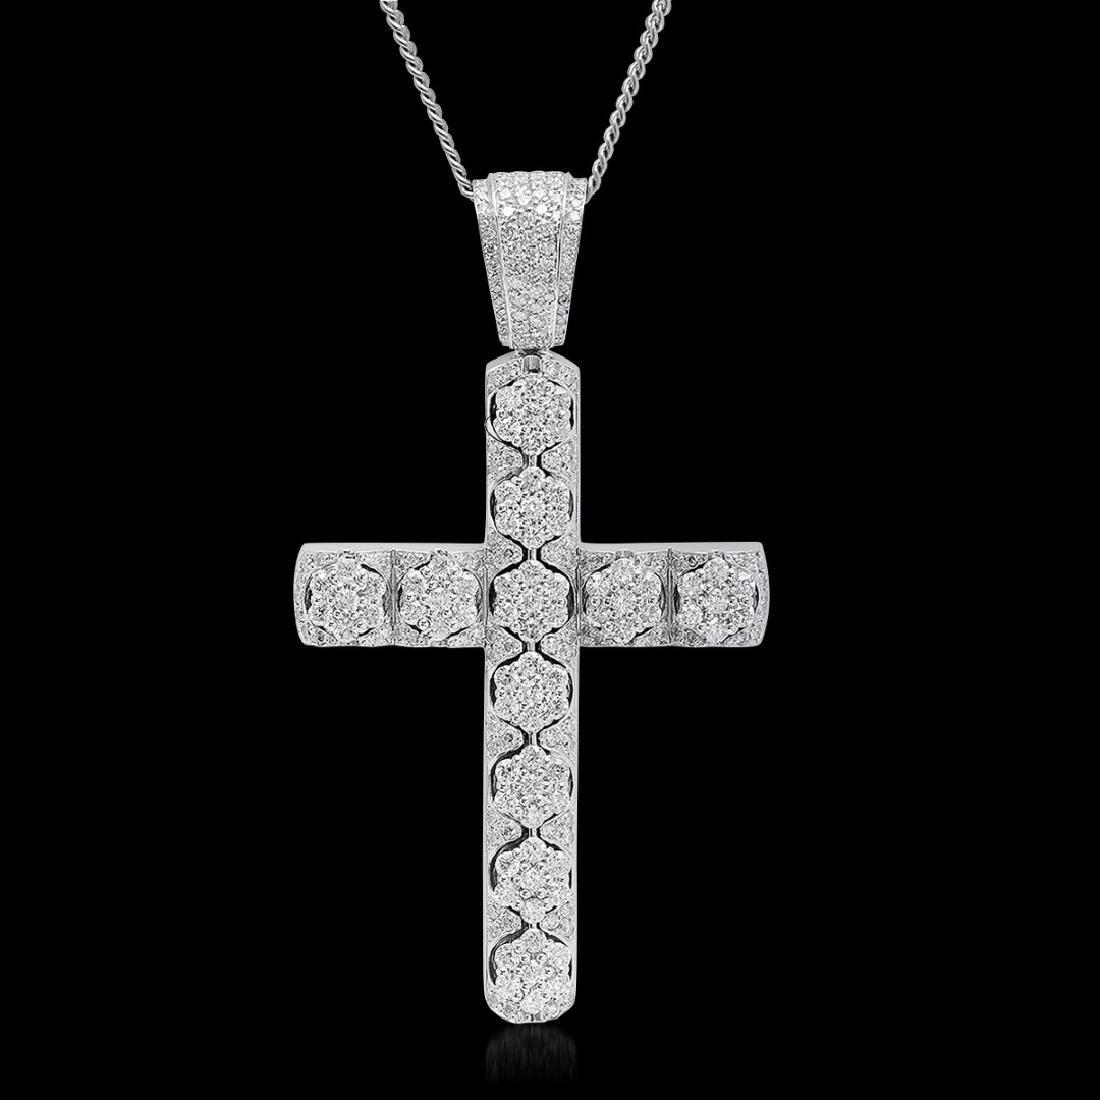 14K White Gold 11.00cts. Diamond Pendant